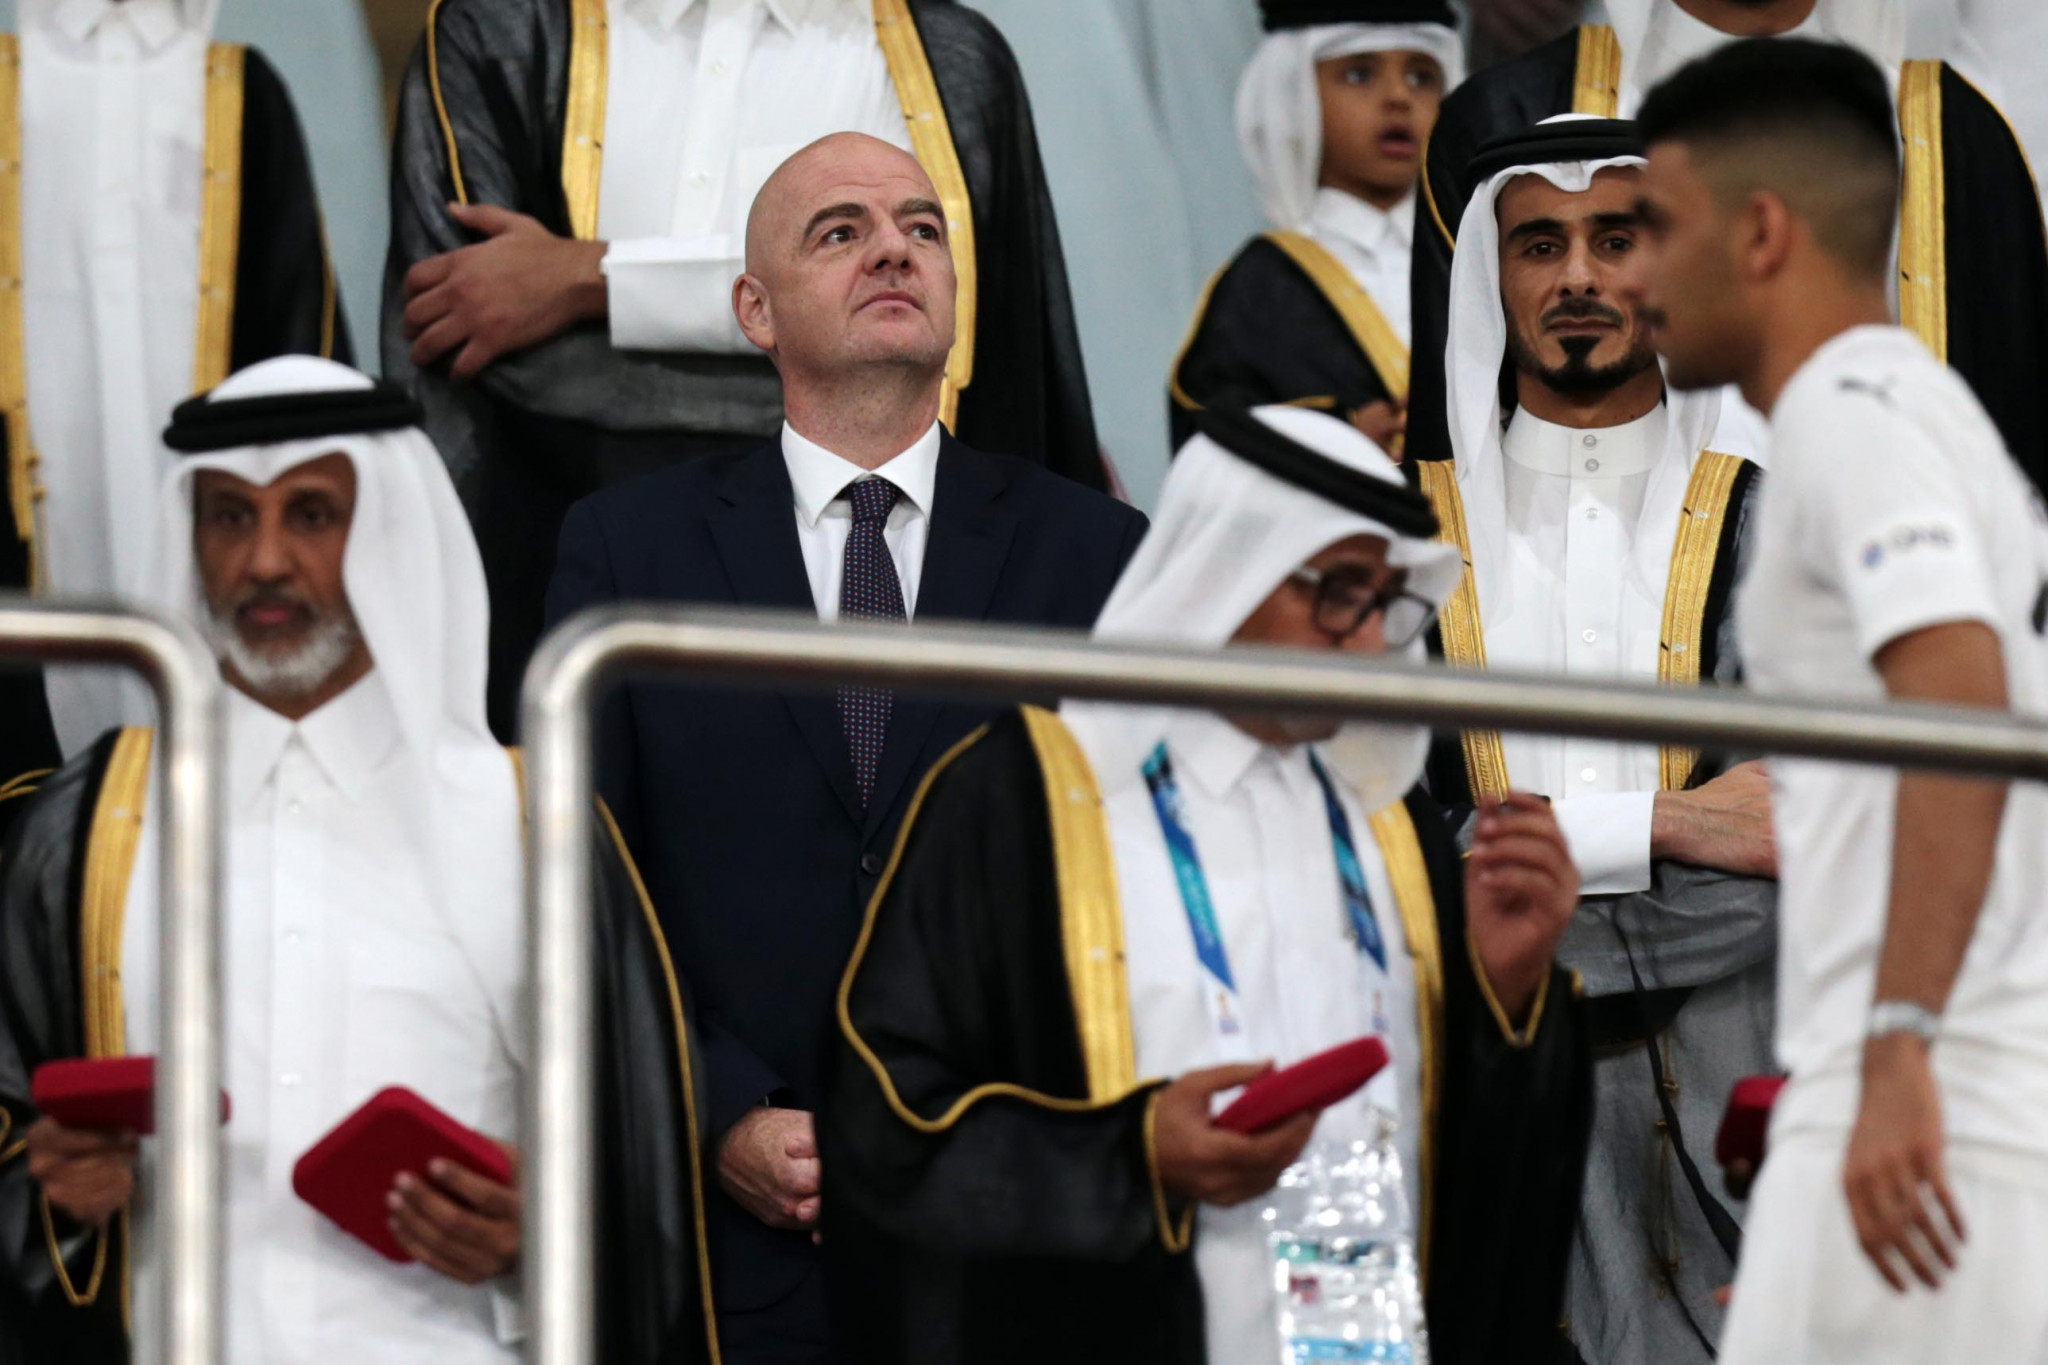 FIFA President Gianni Infantino described as